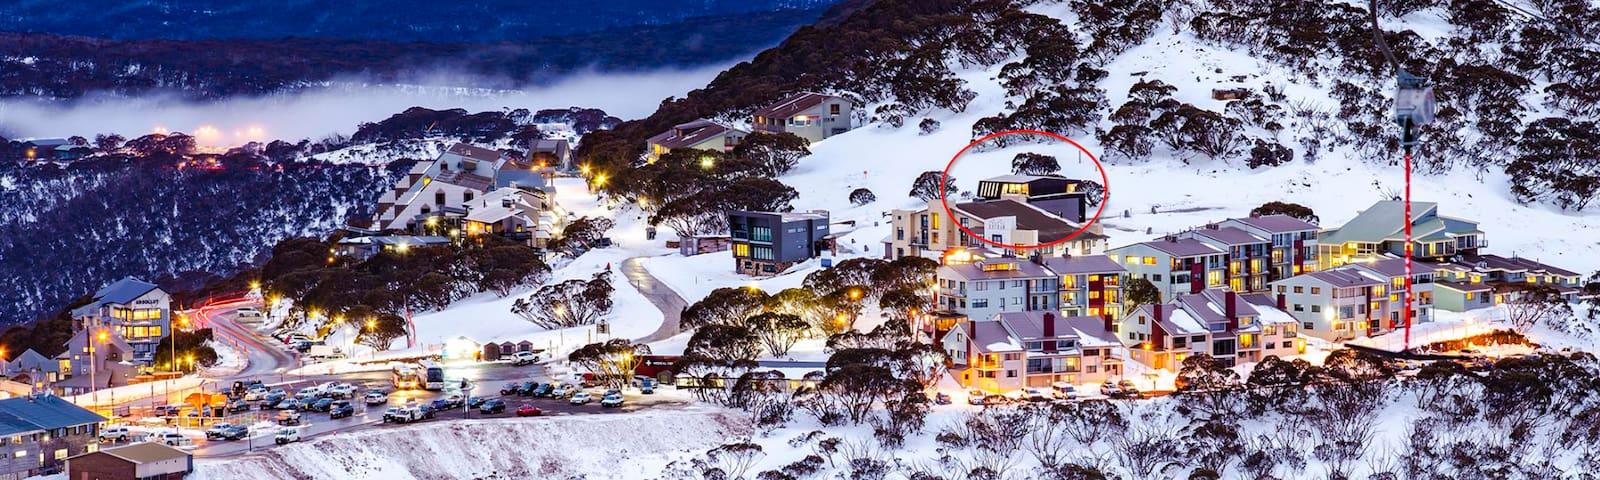 'Mink', Summertime or Snowtime Alpine Retreat